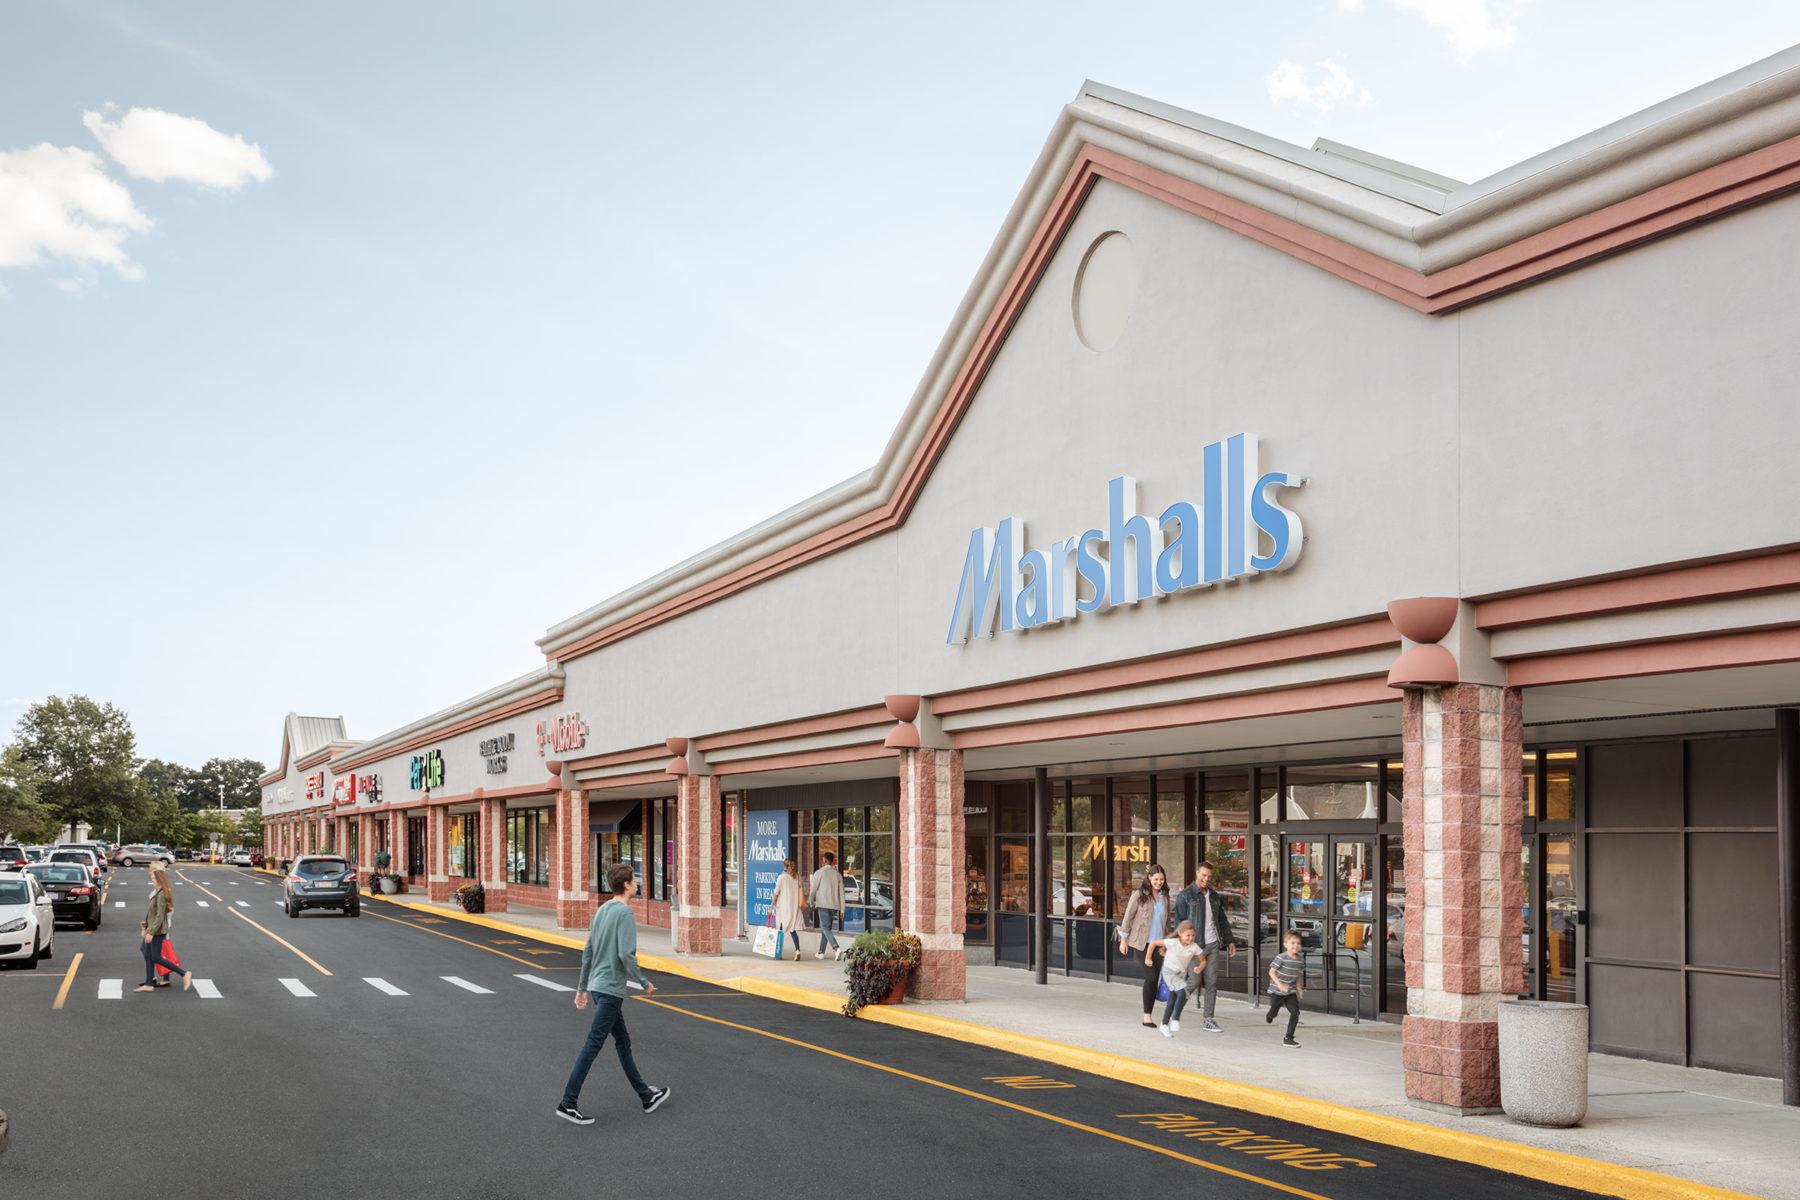 redstone shopping center ws development